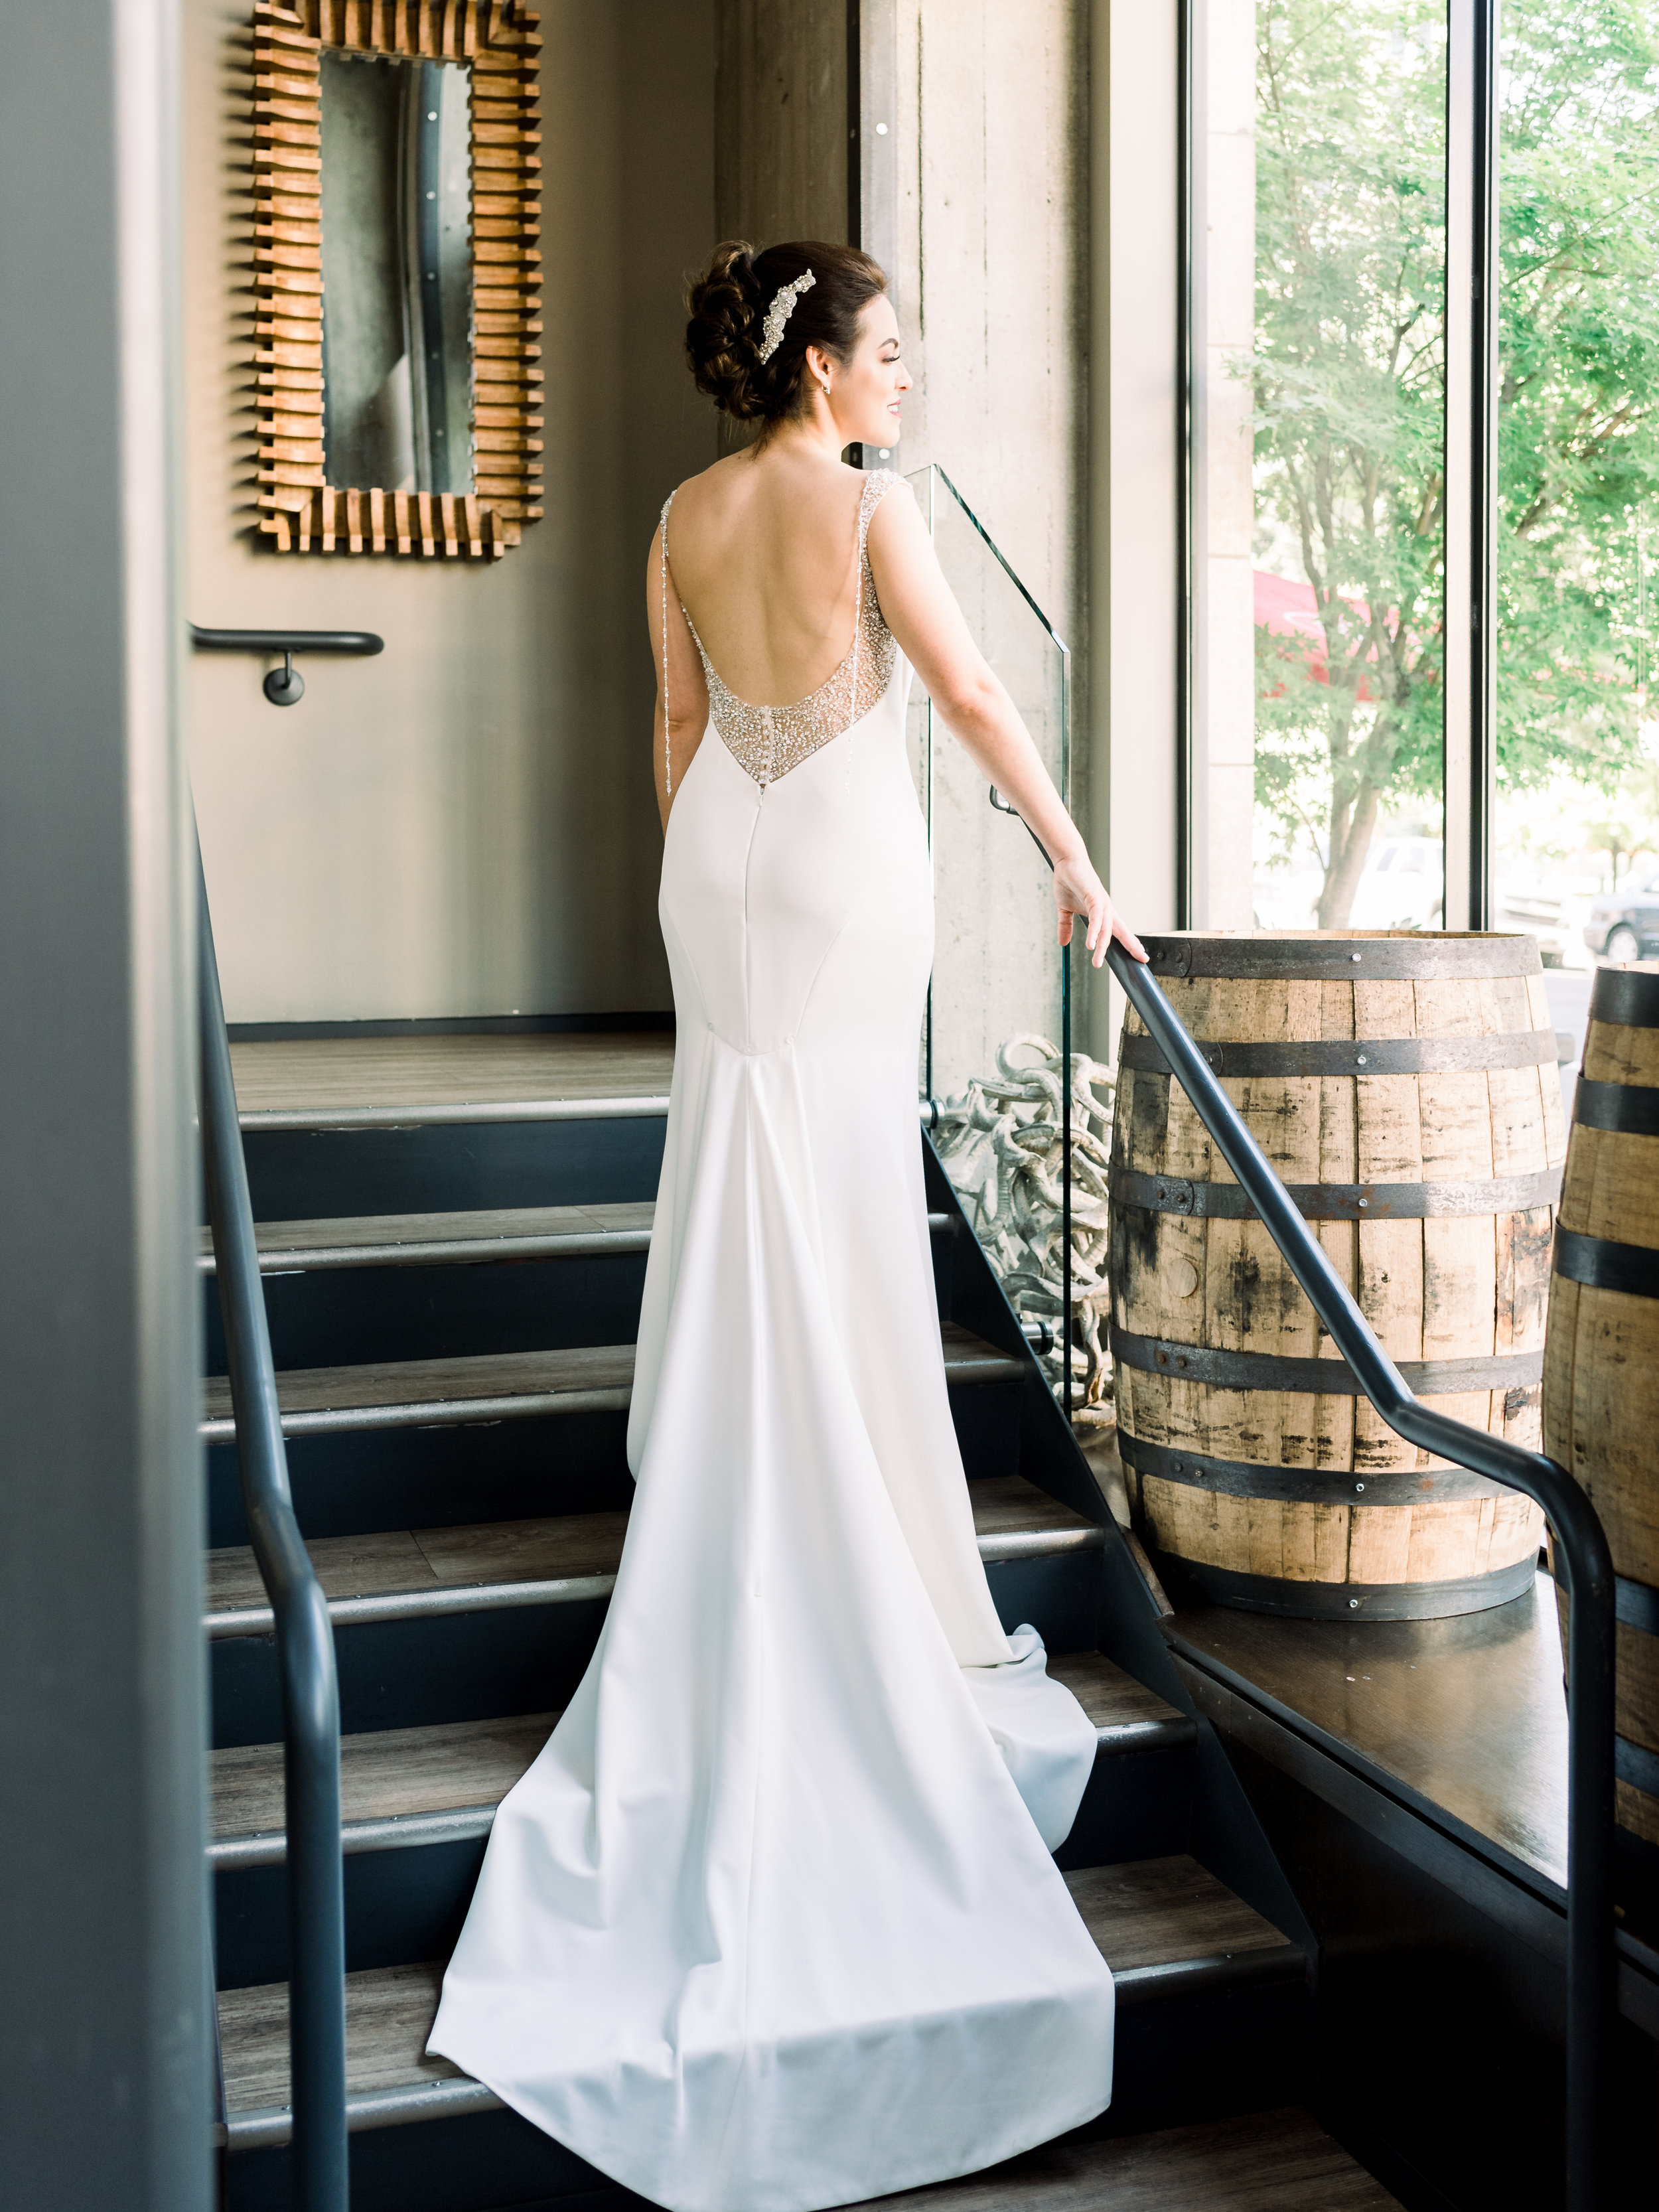 portrait-of-the-bride.jpg